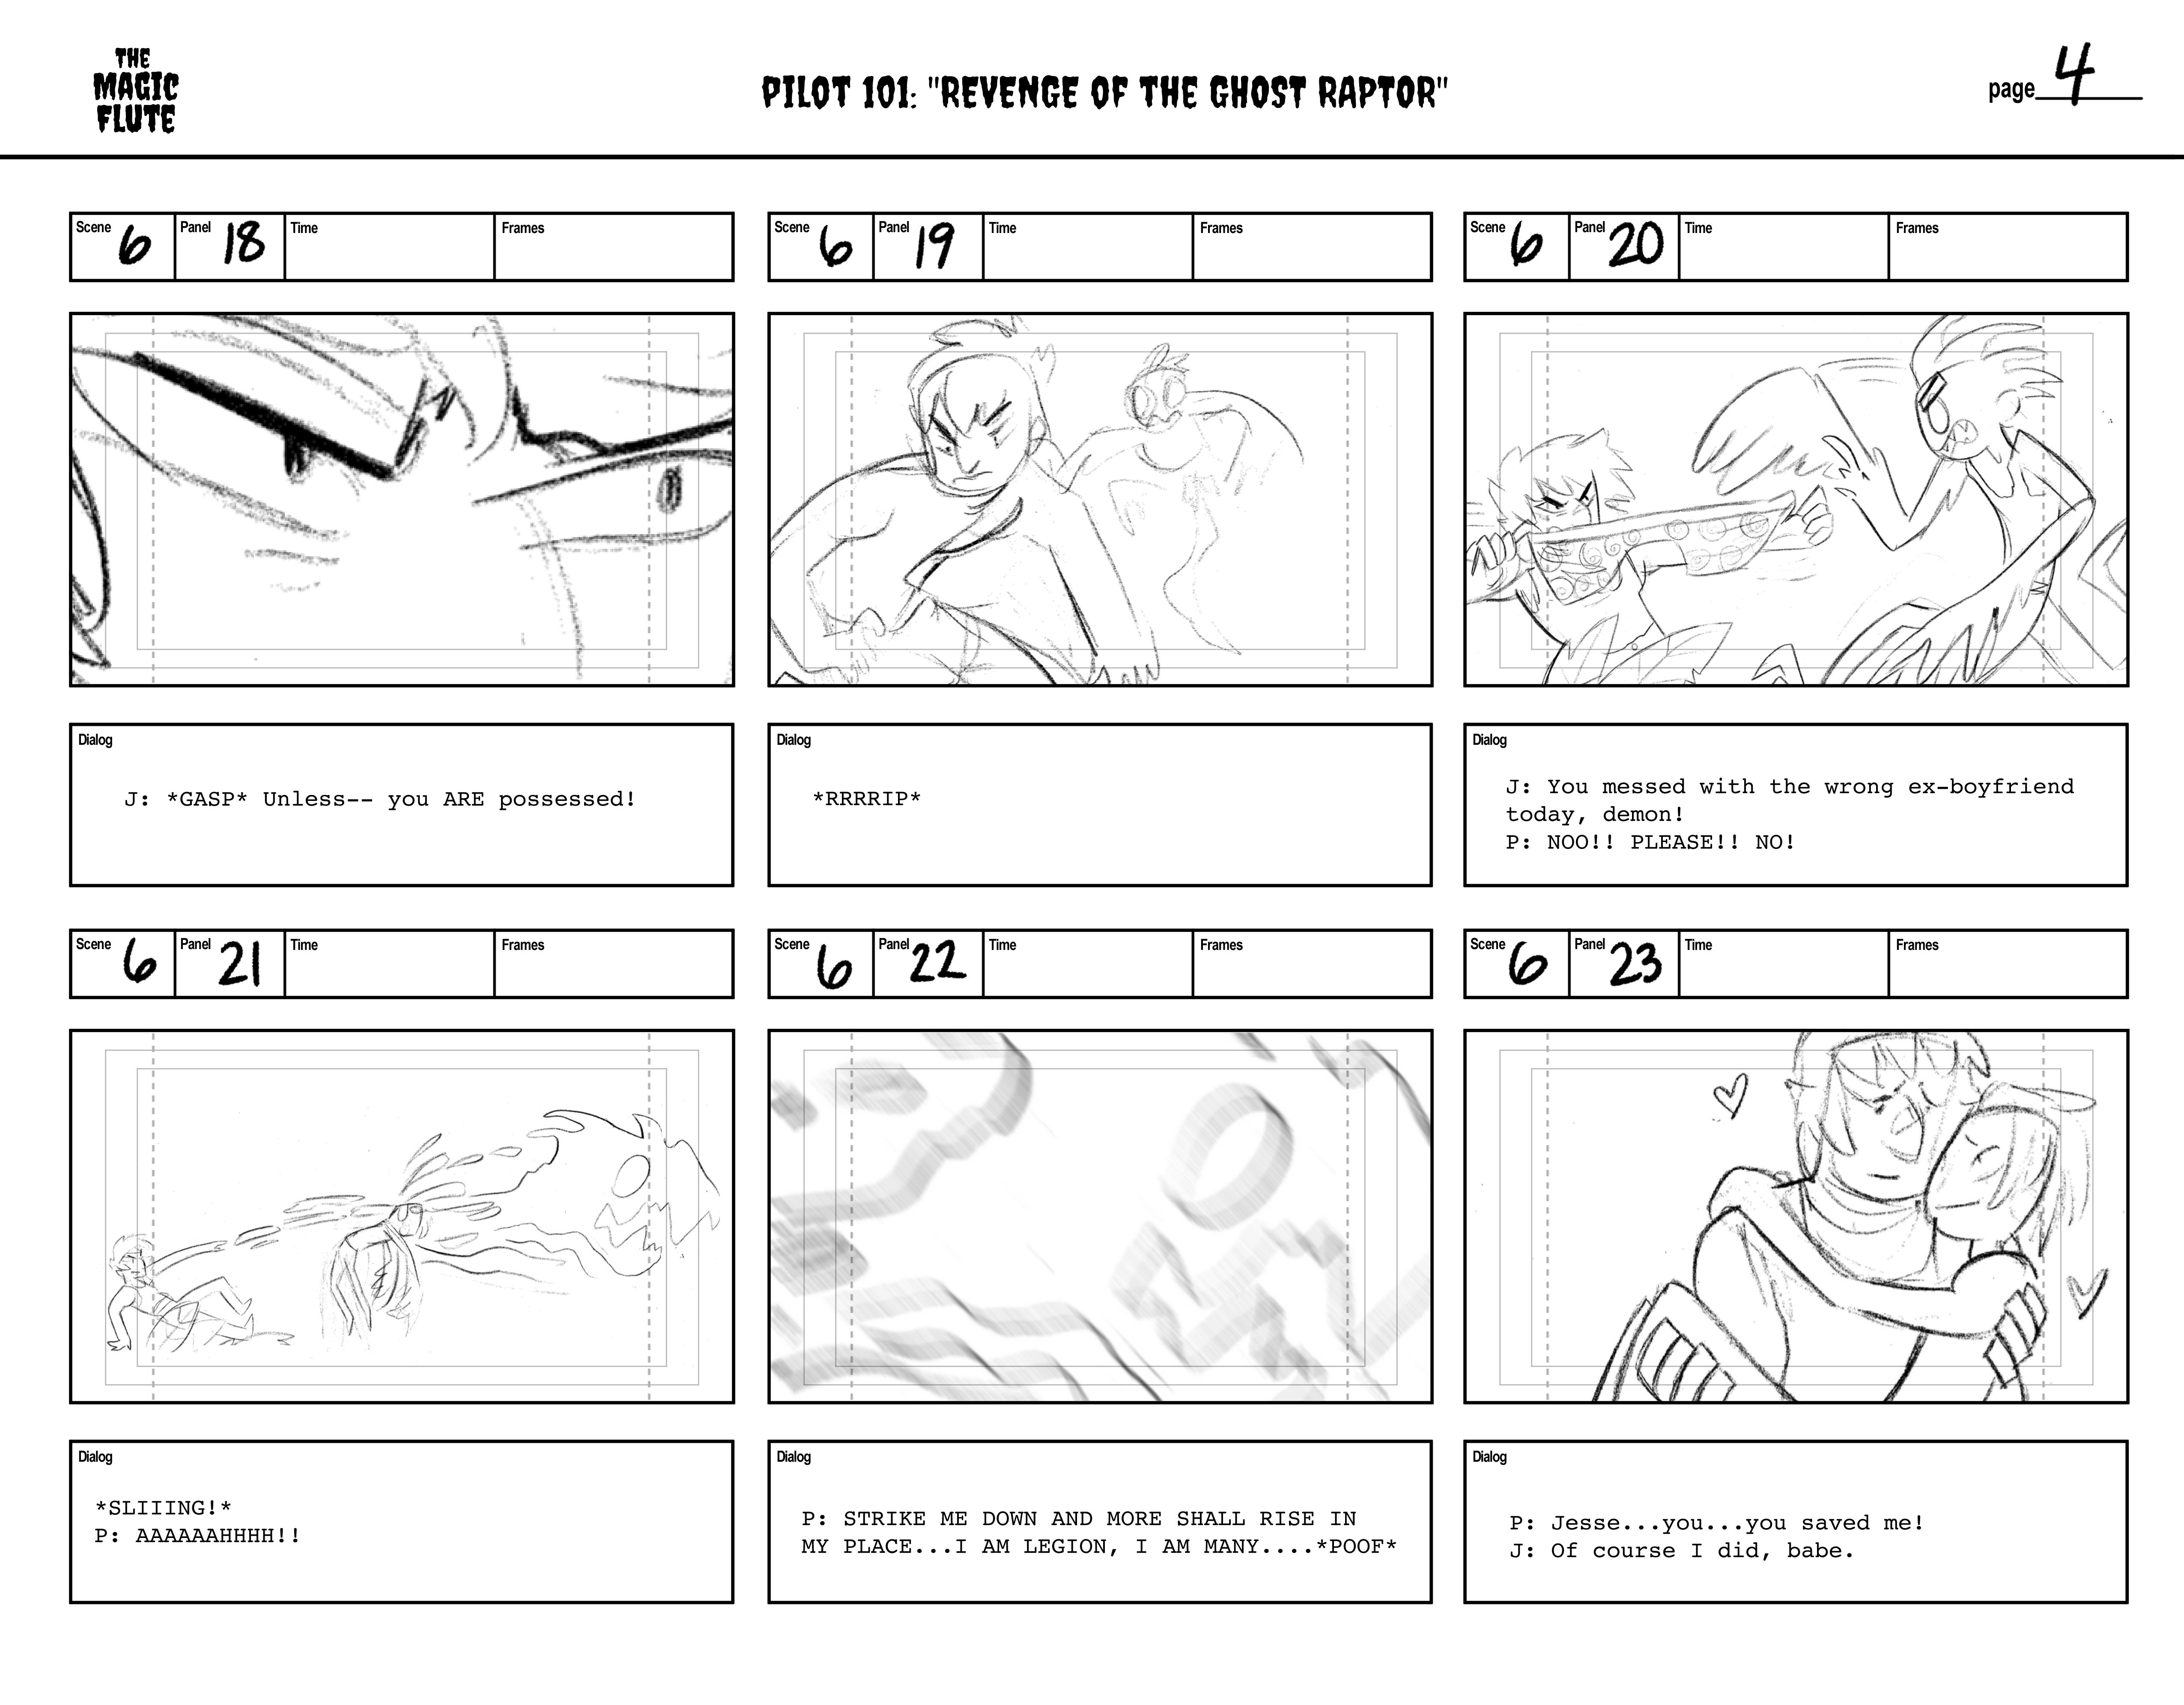 Storyboards 19-24